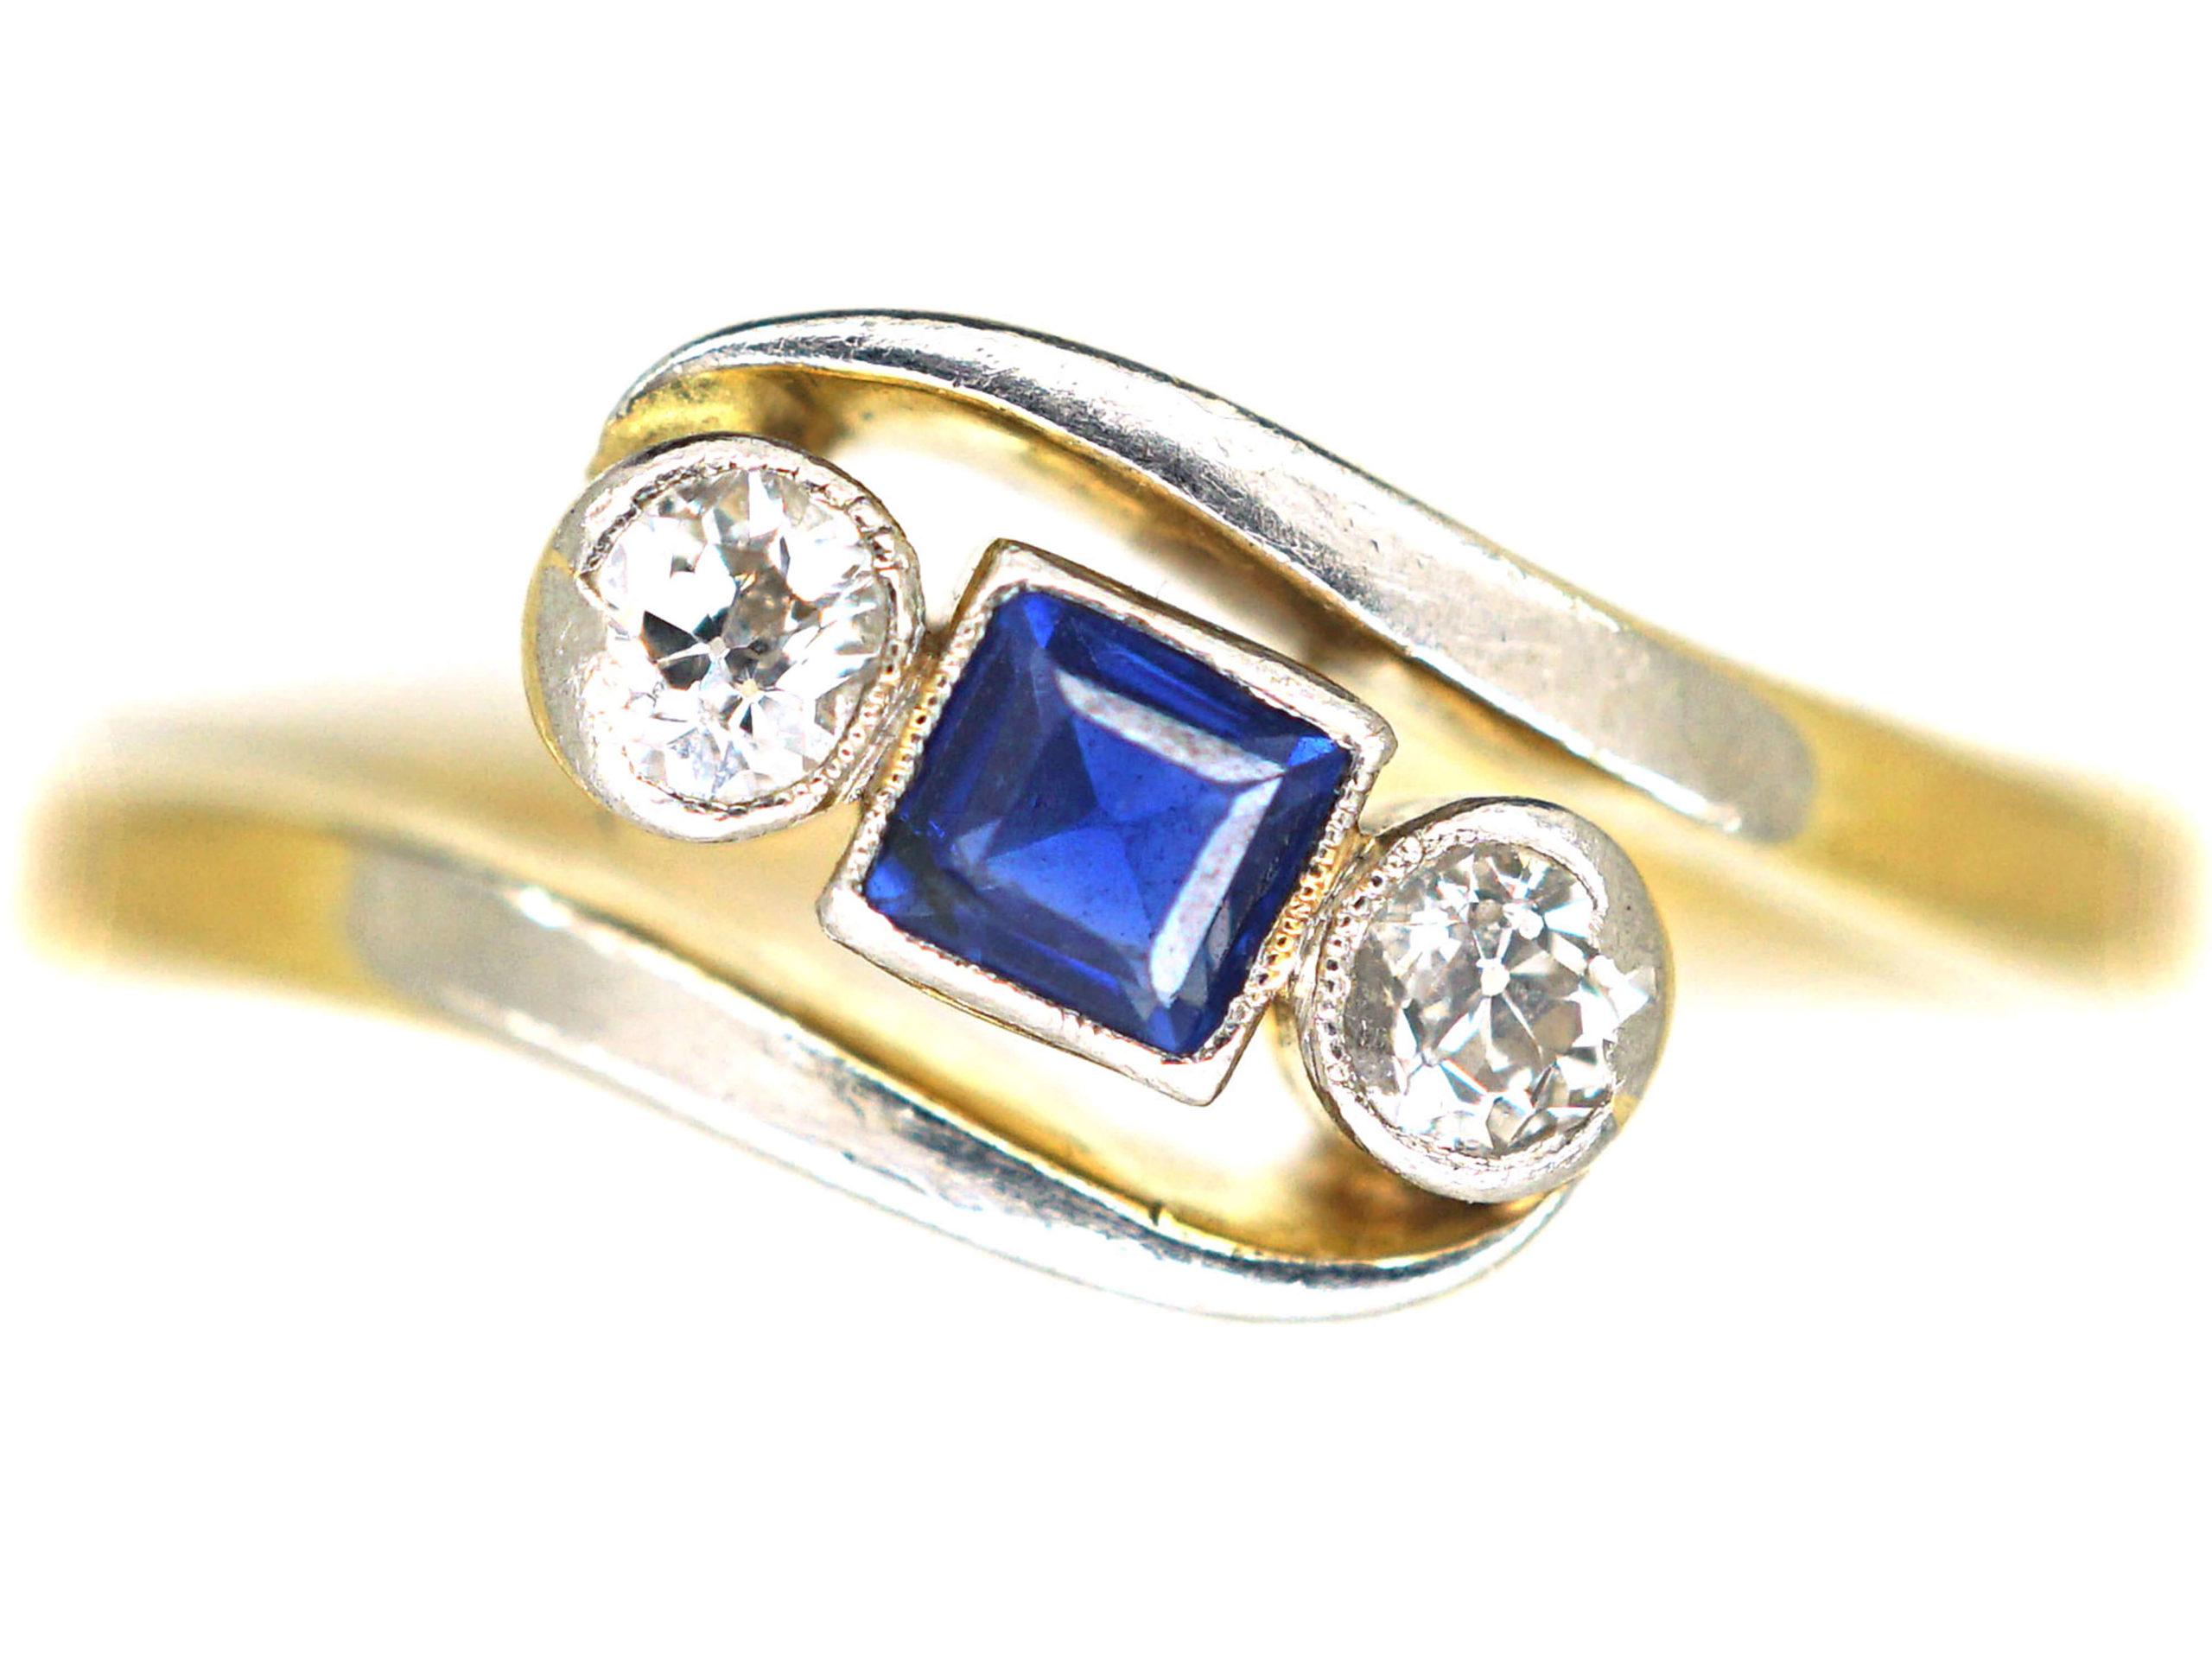 Art Deco 18ct Gold & Platinum, Diamond & Sapphire Crossover Ring